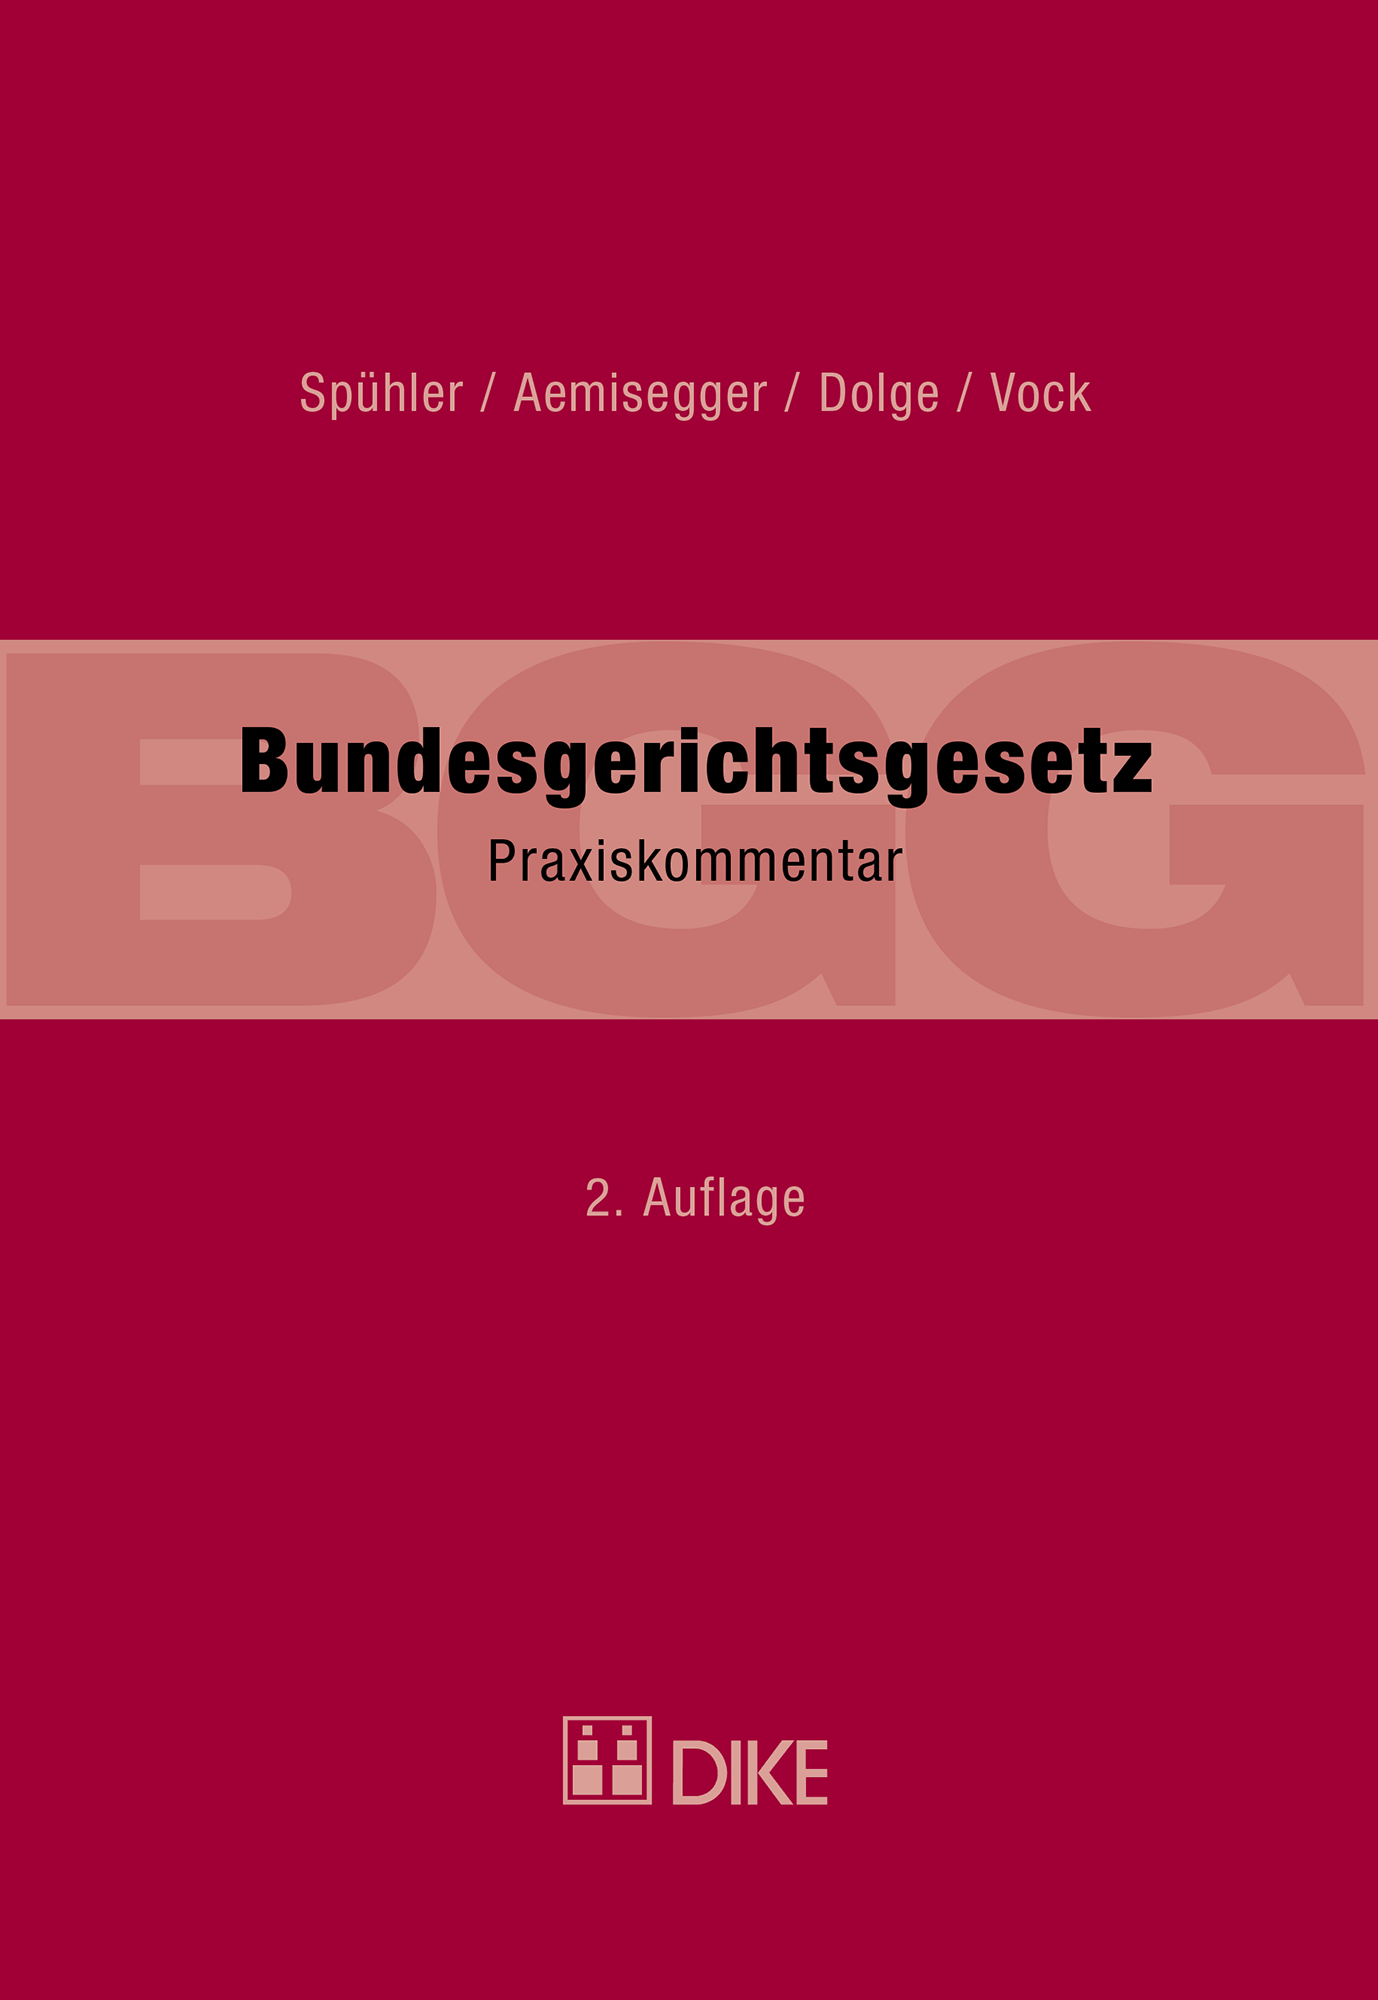 Bundesgerichtsgesetz (BGG)